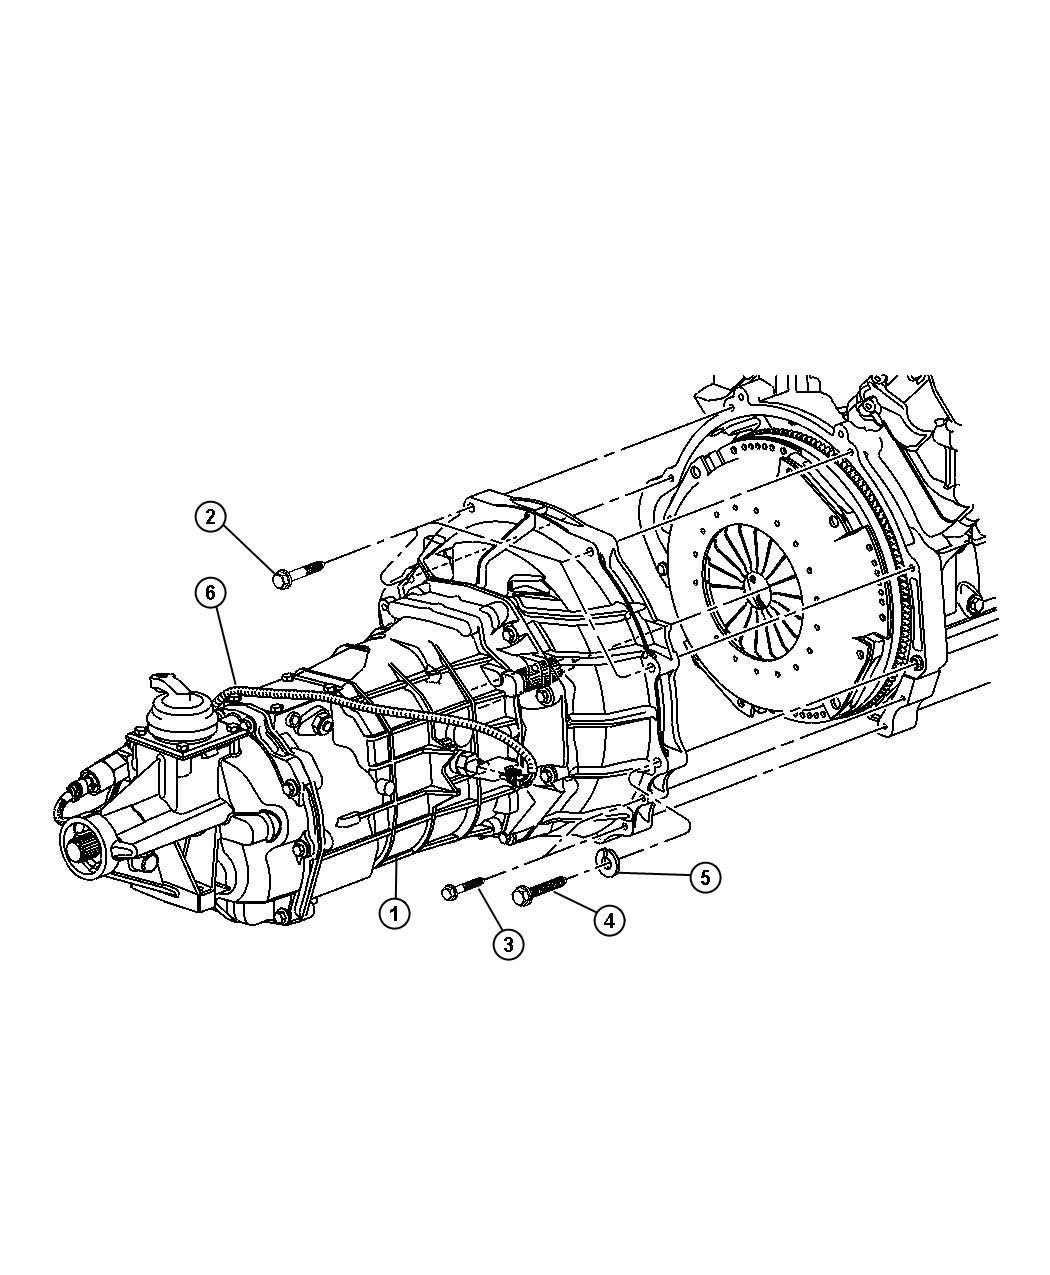 Dodge Ram Screw Hex Head 437 14x2 75 Mounting